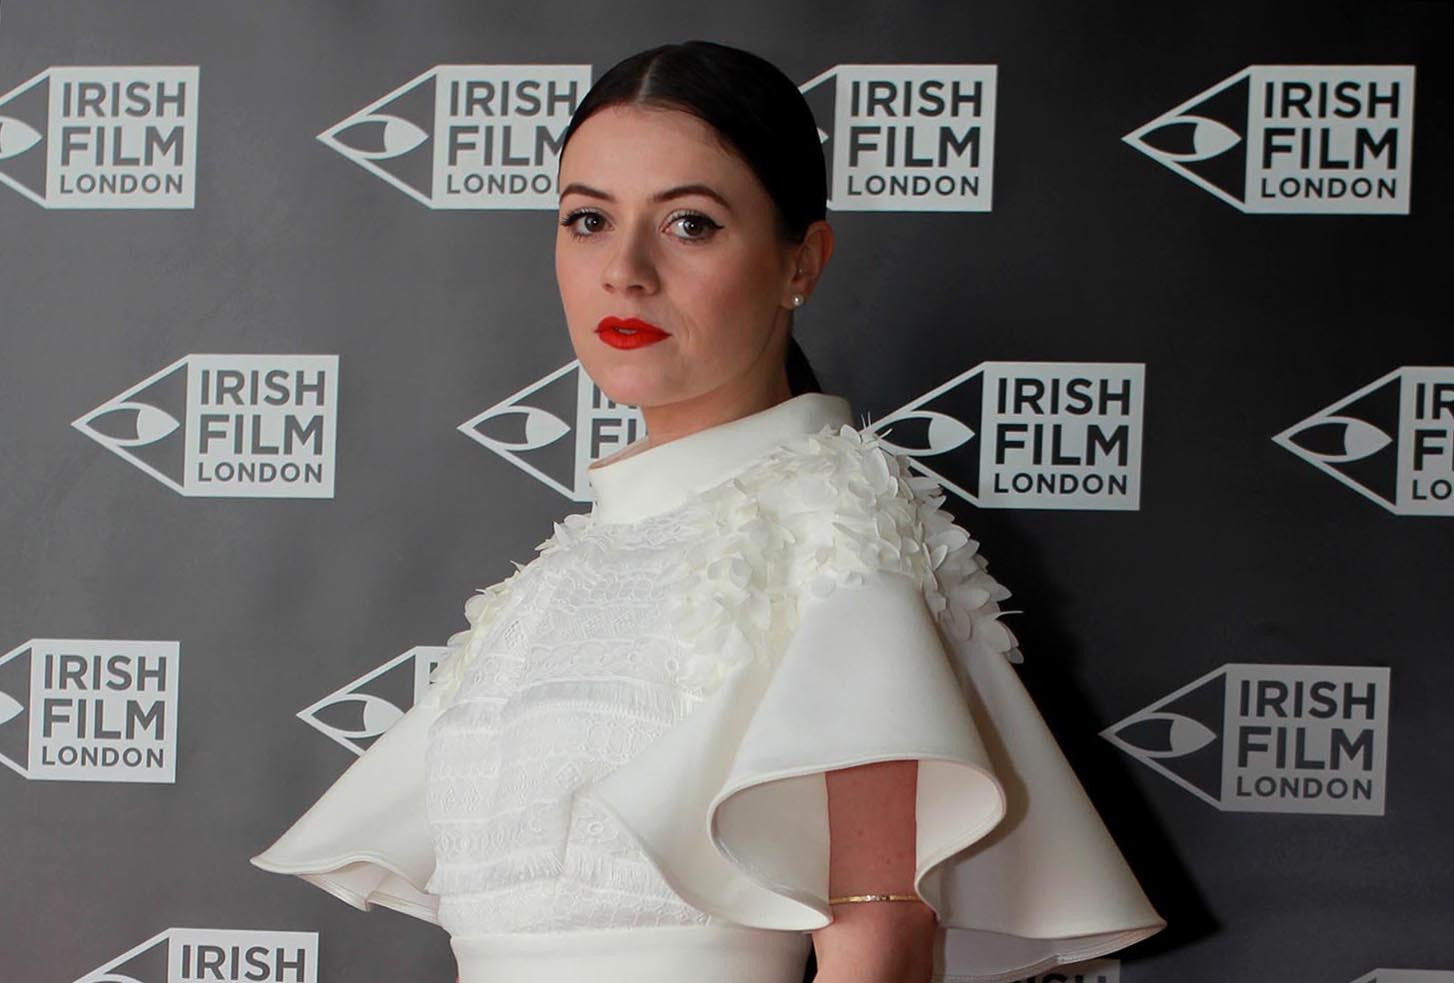 Irish actress Gemma Leah Devereux on the red carpet at the Irish Film London Awards 2017